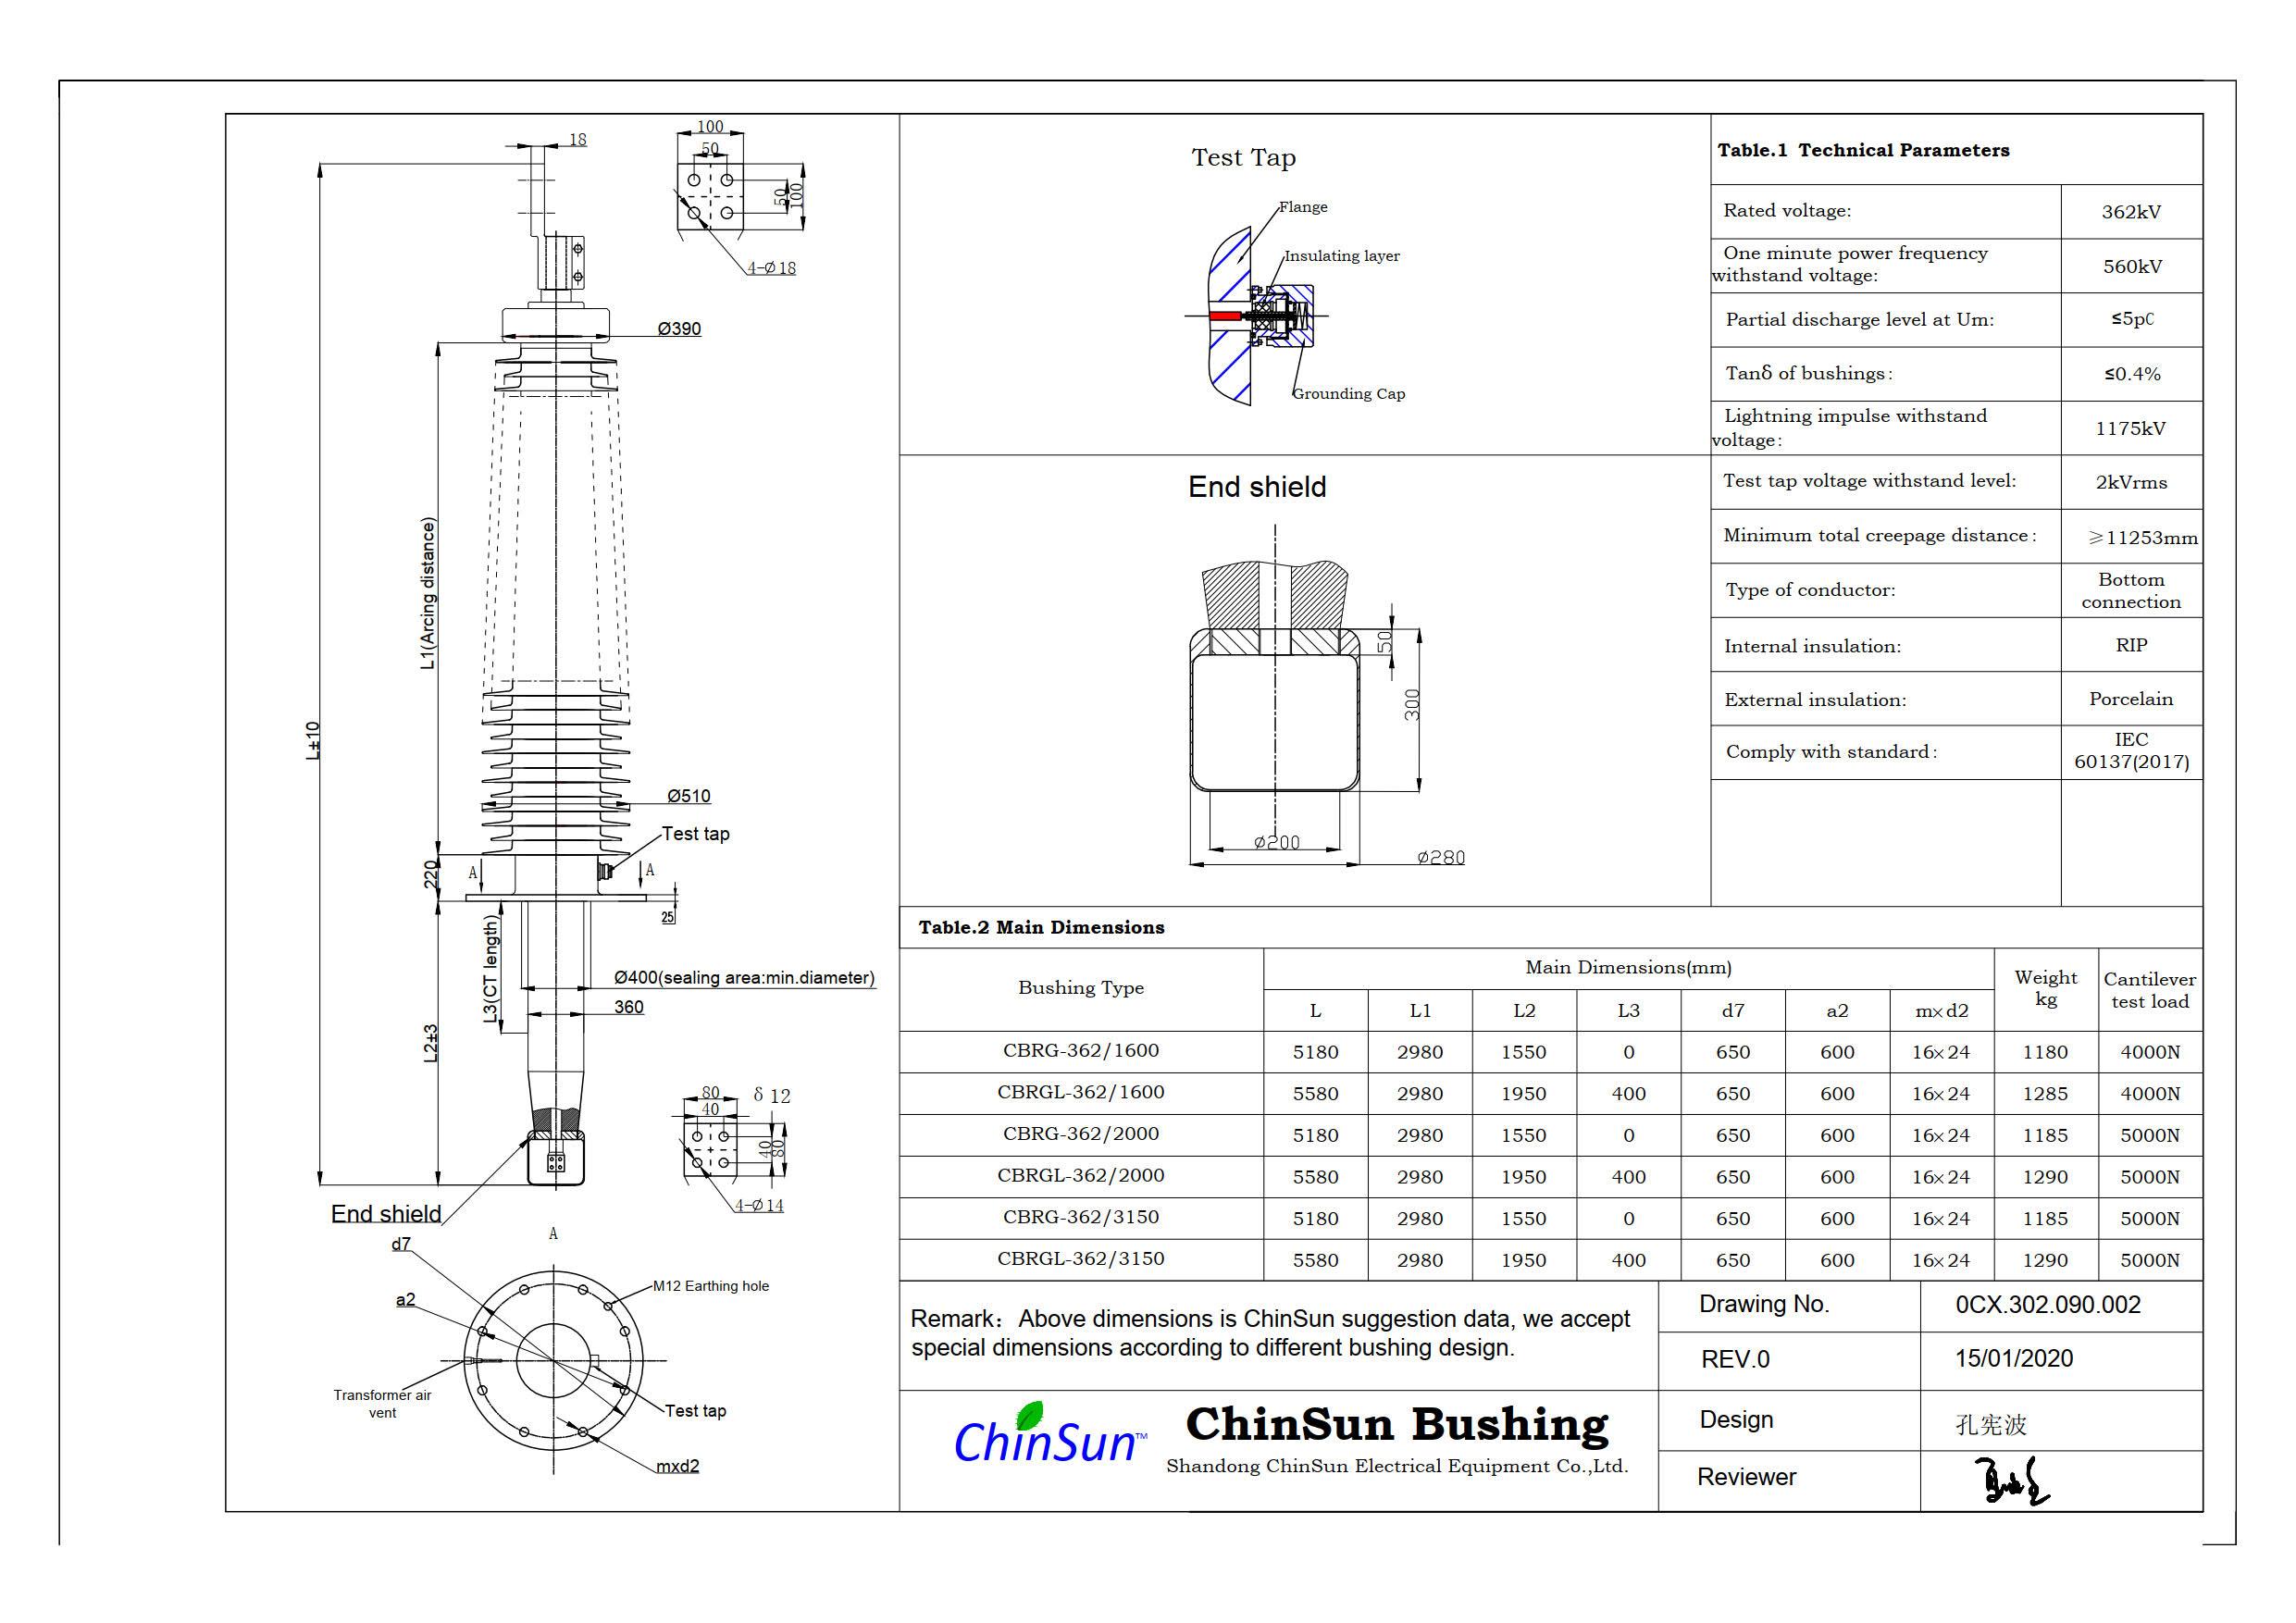 Drawing-transformer bushing-362kV porcelain-BC-ChinSun